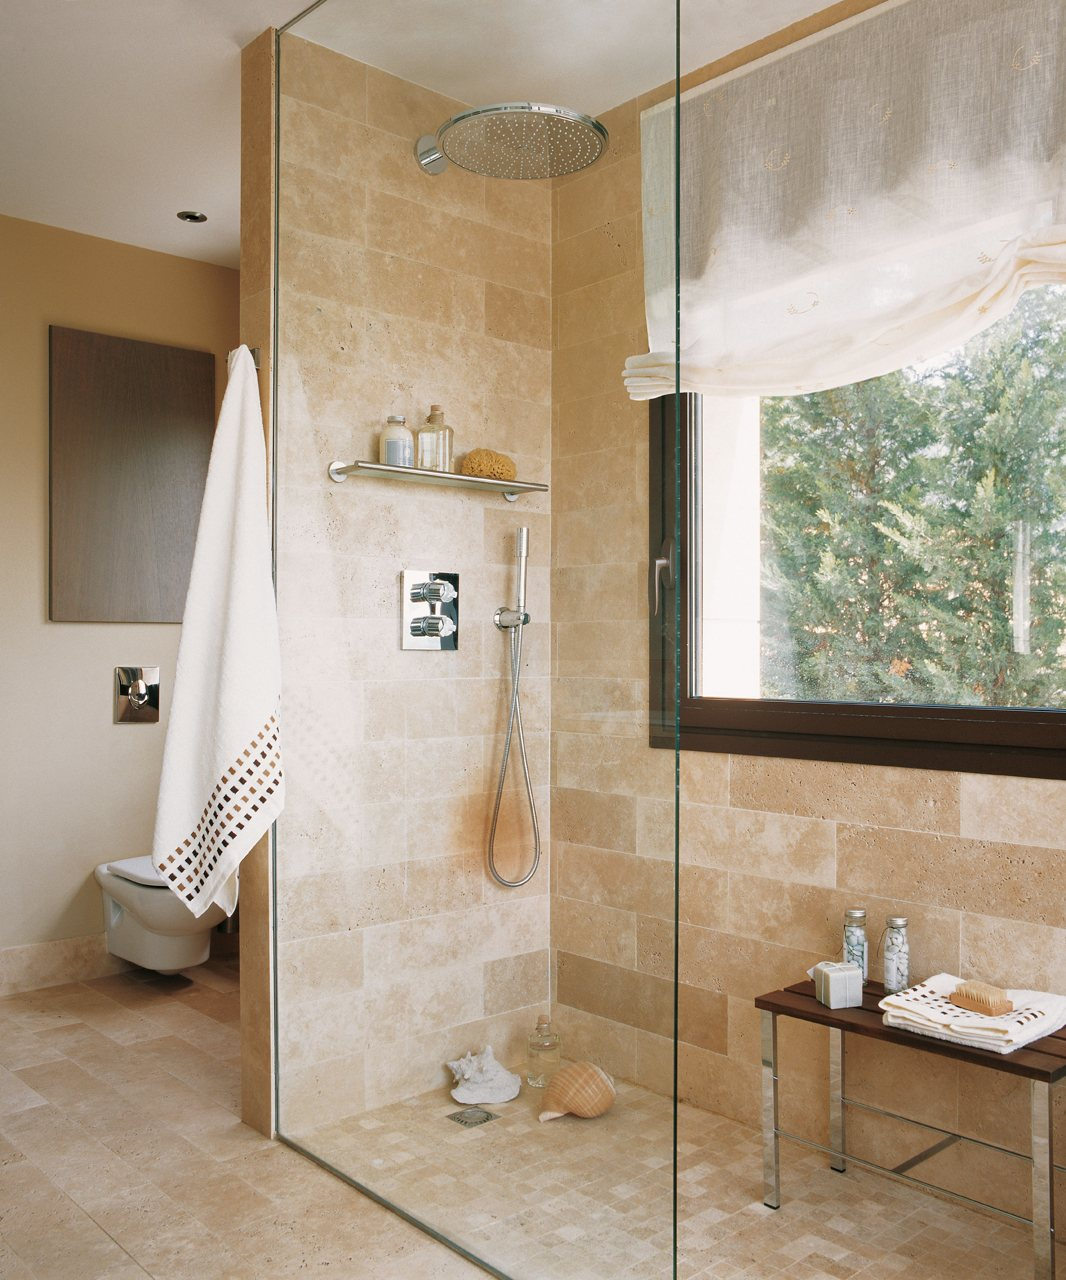 ba o actual zalo sin gastar mucho On armarios para dentro ducha